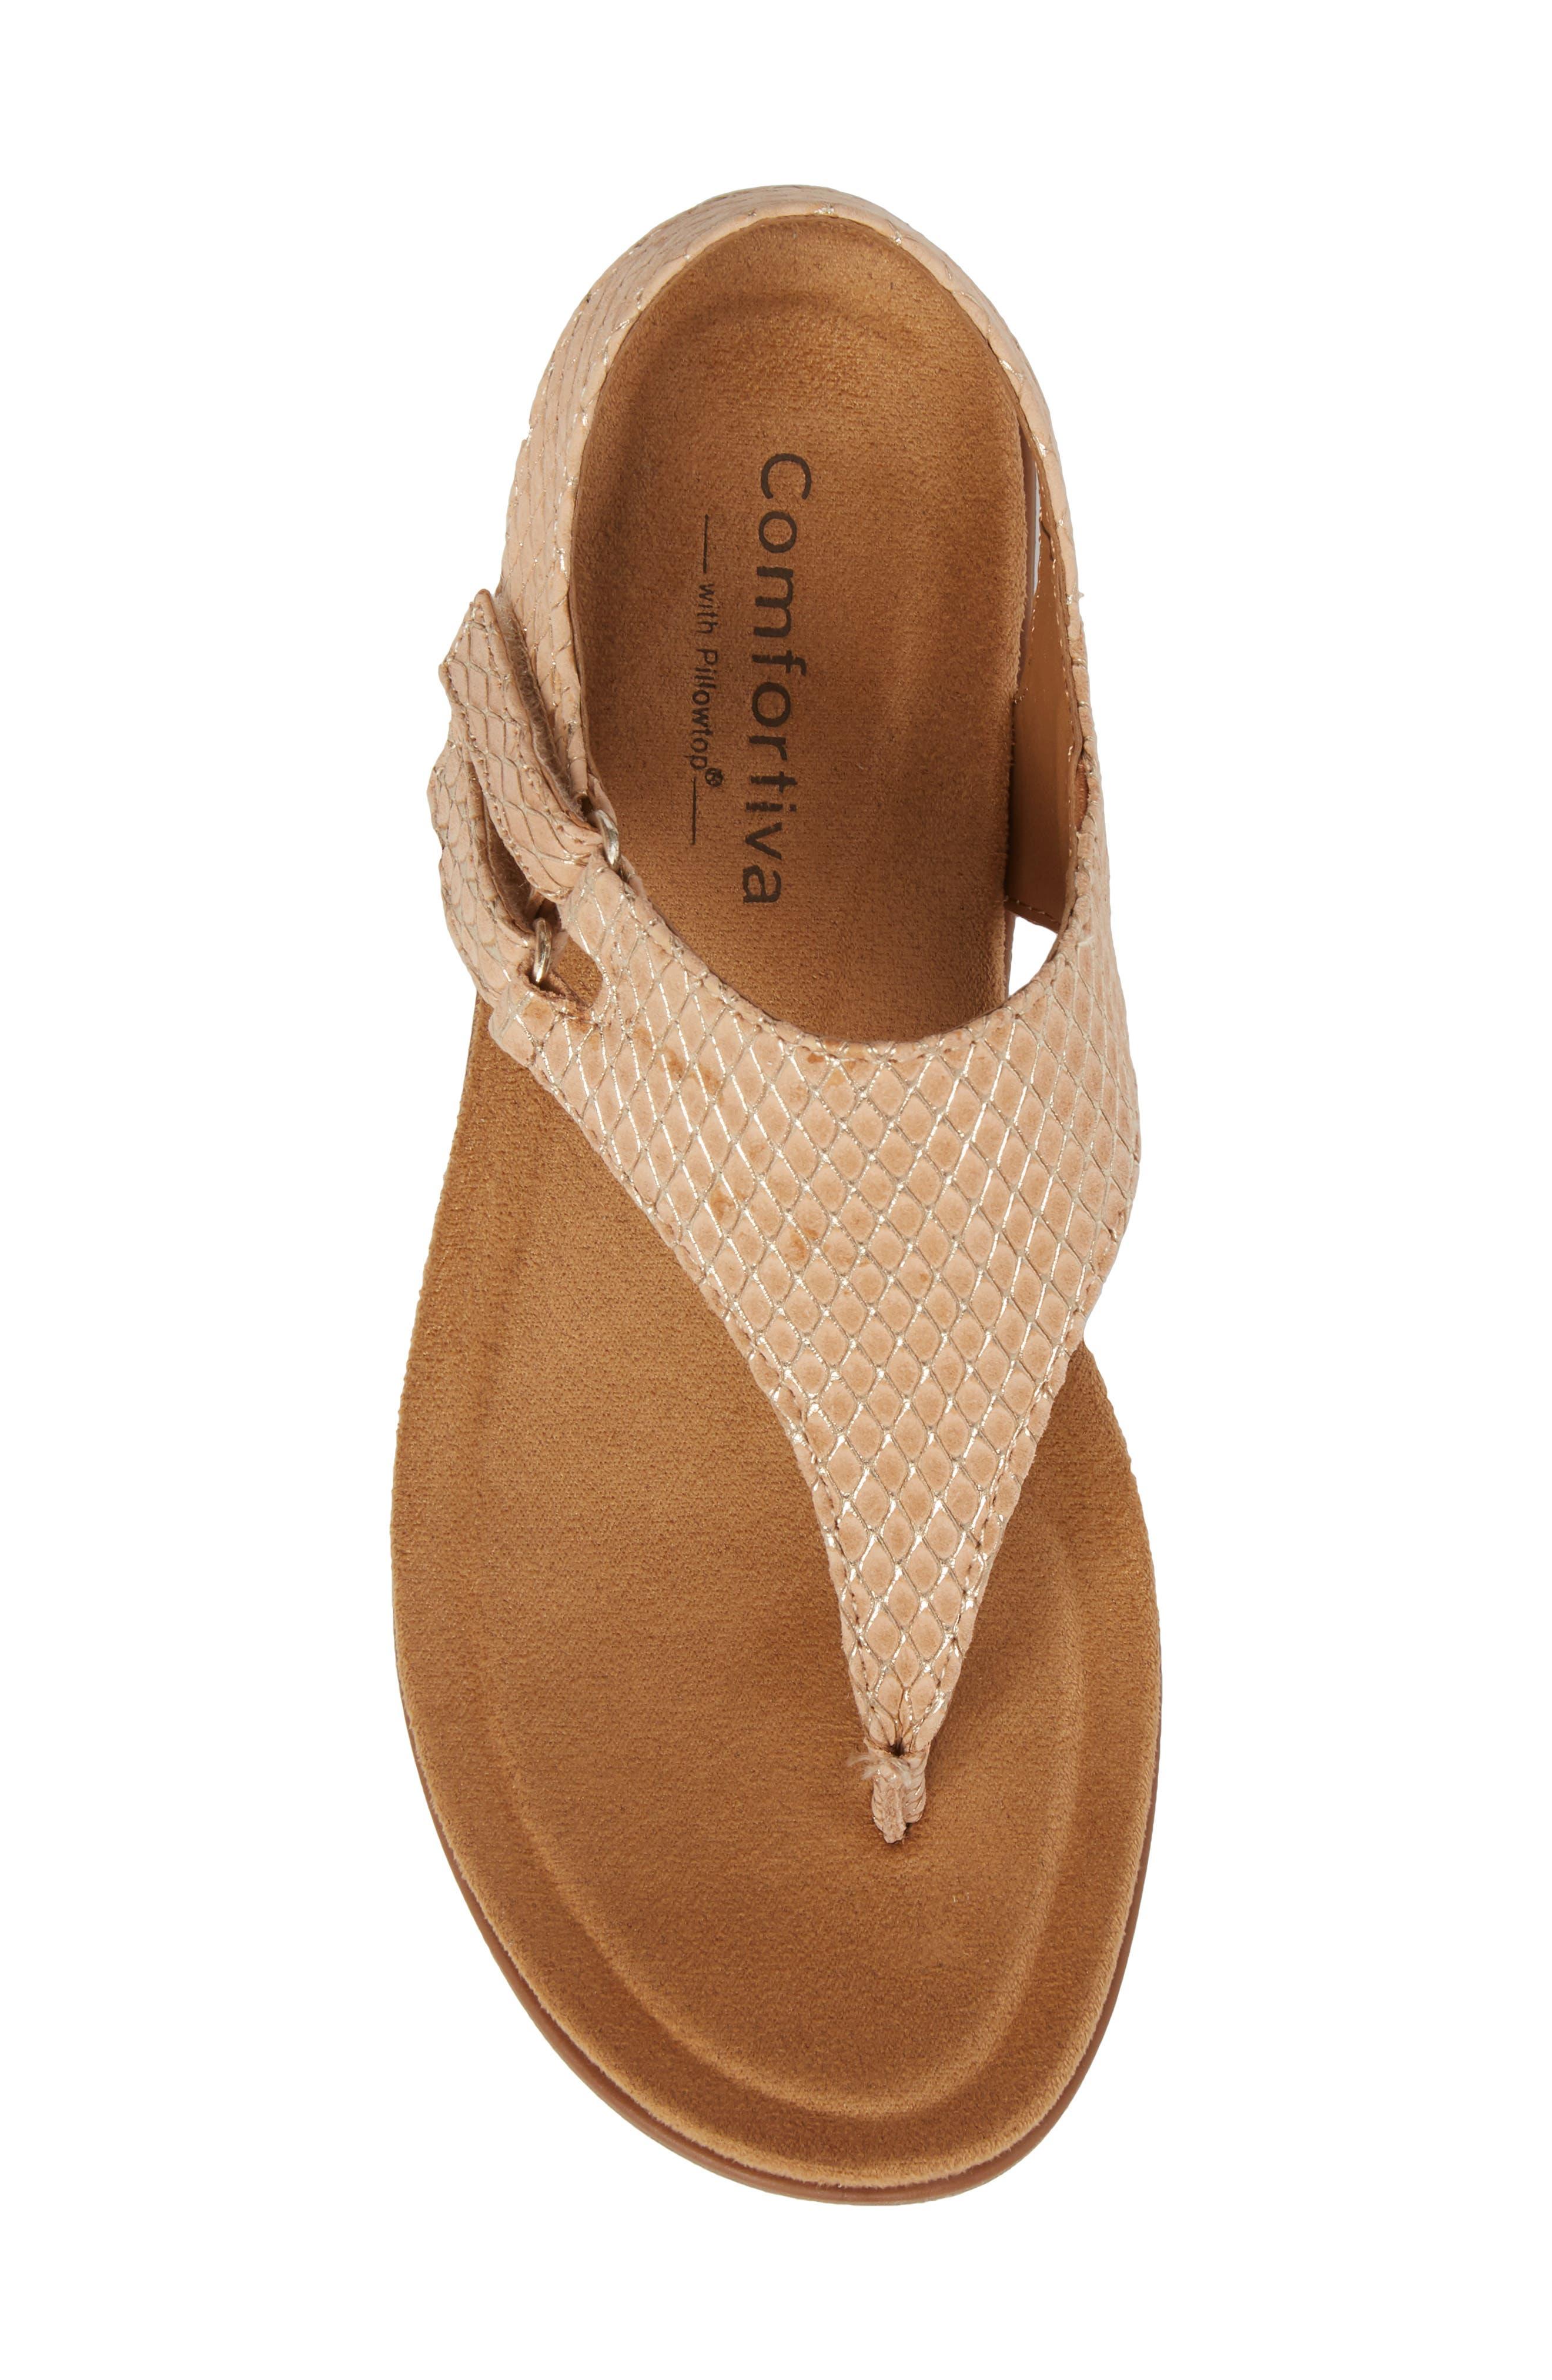 Calina Sandal,                             Alternate thumbnail 5, color,                             Sand Nubuck Leather